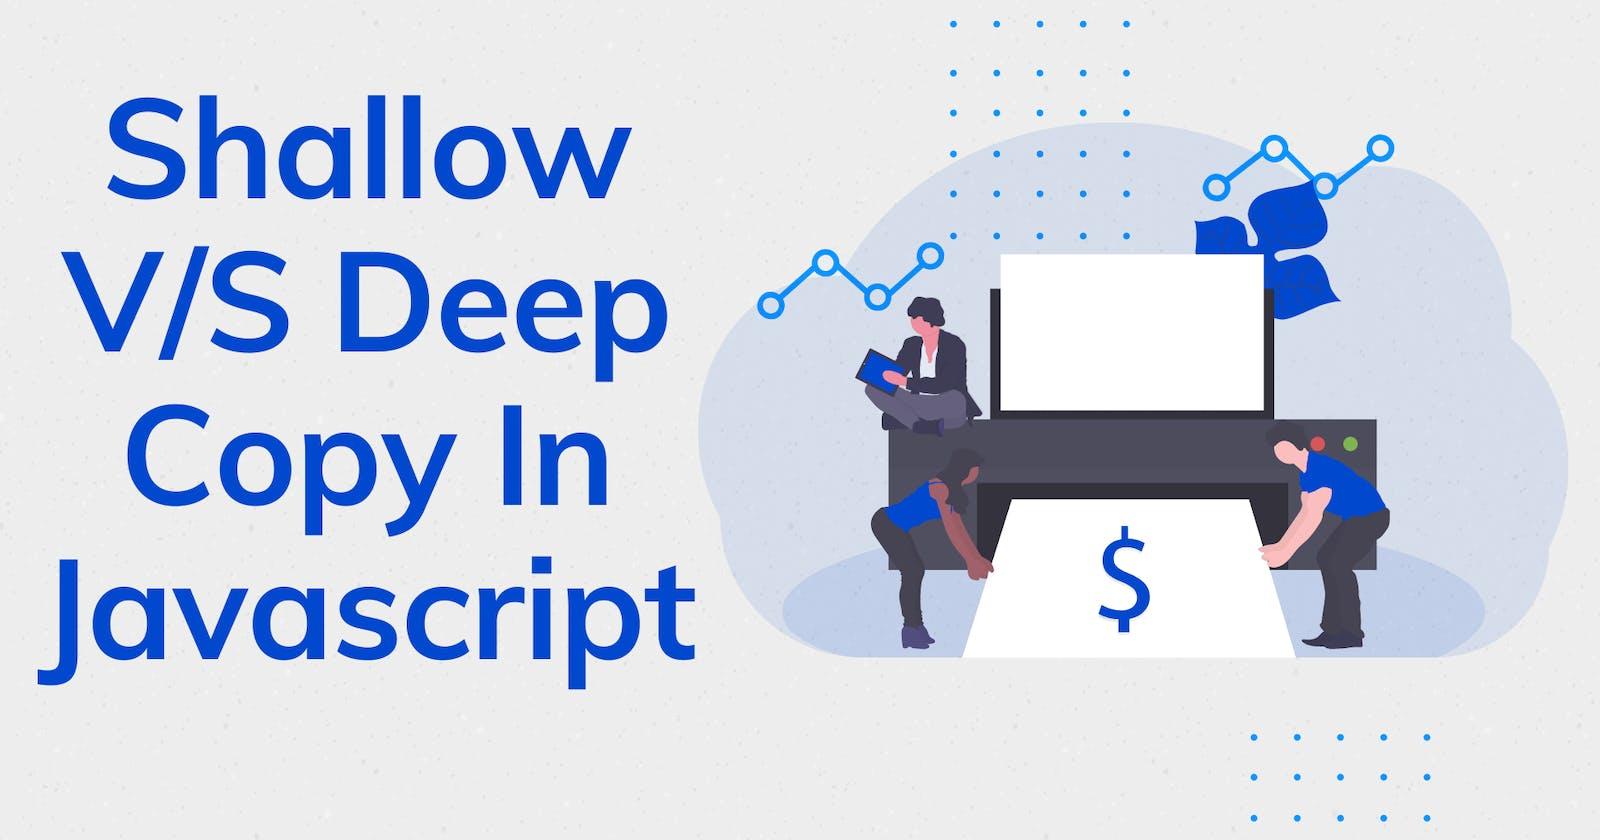 Shallow Vs Deep Copy In Javascript